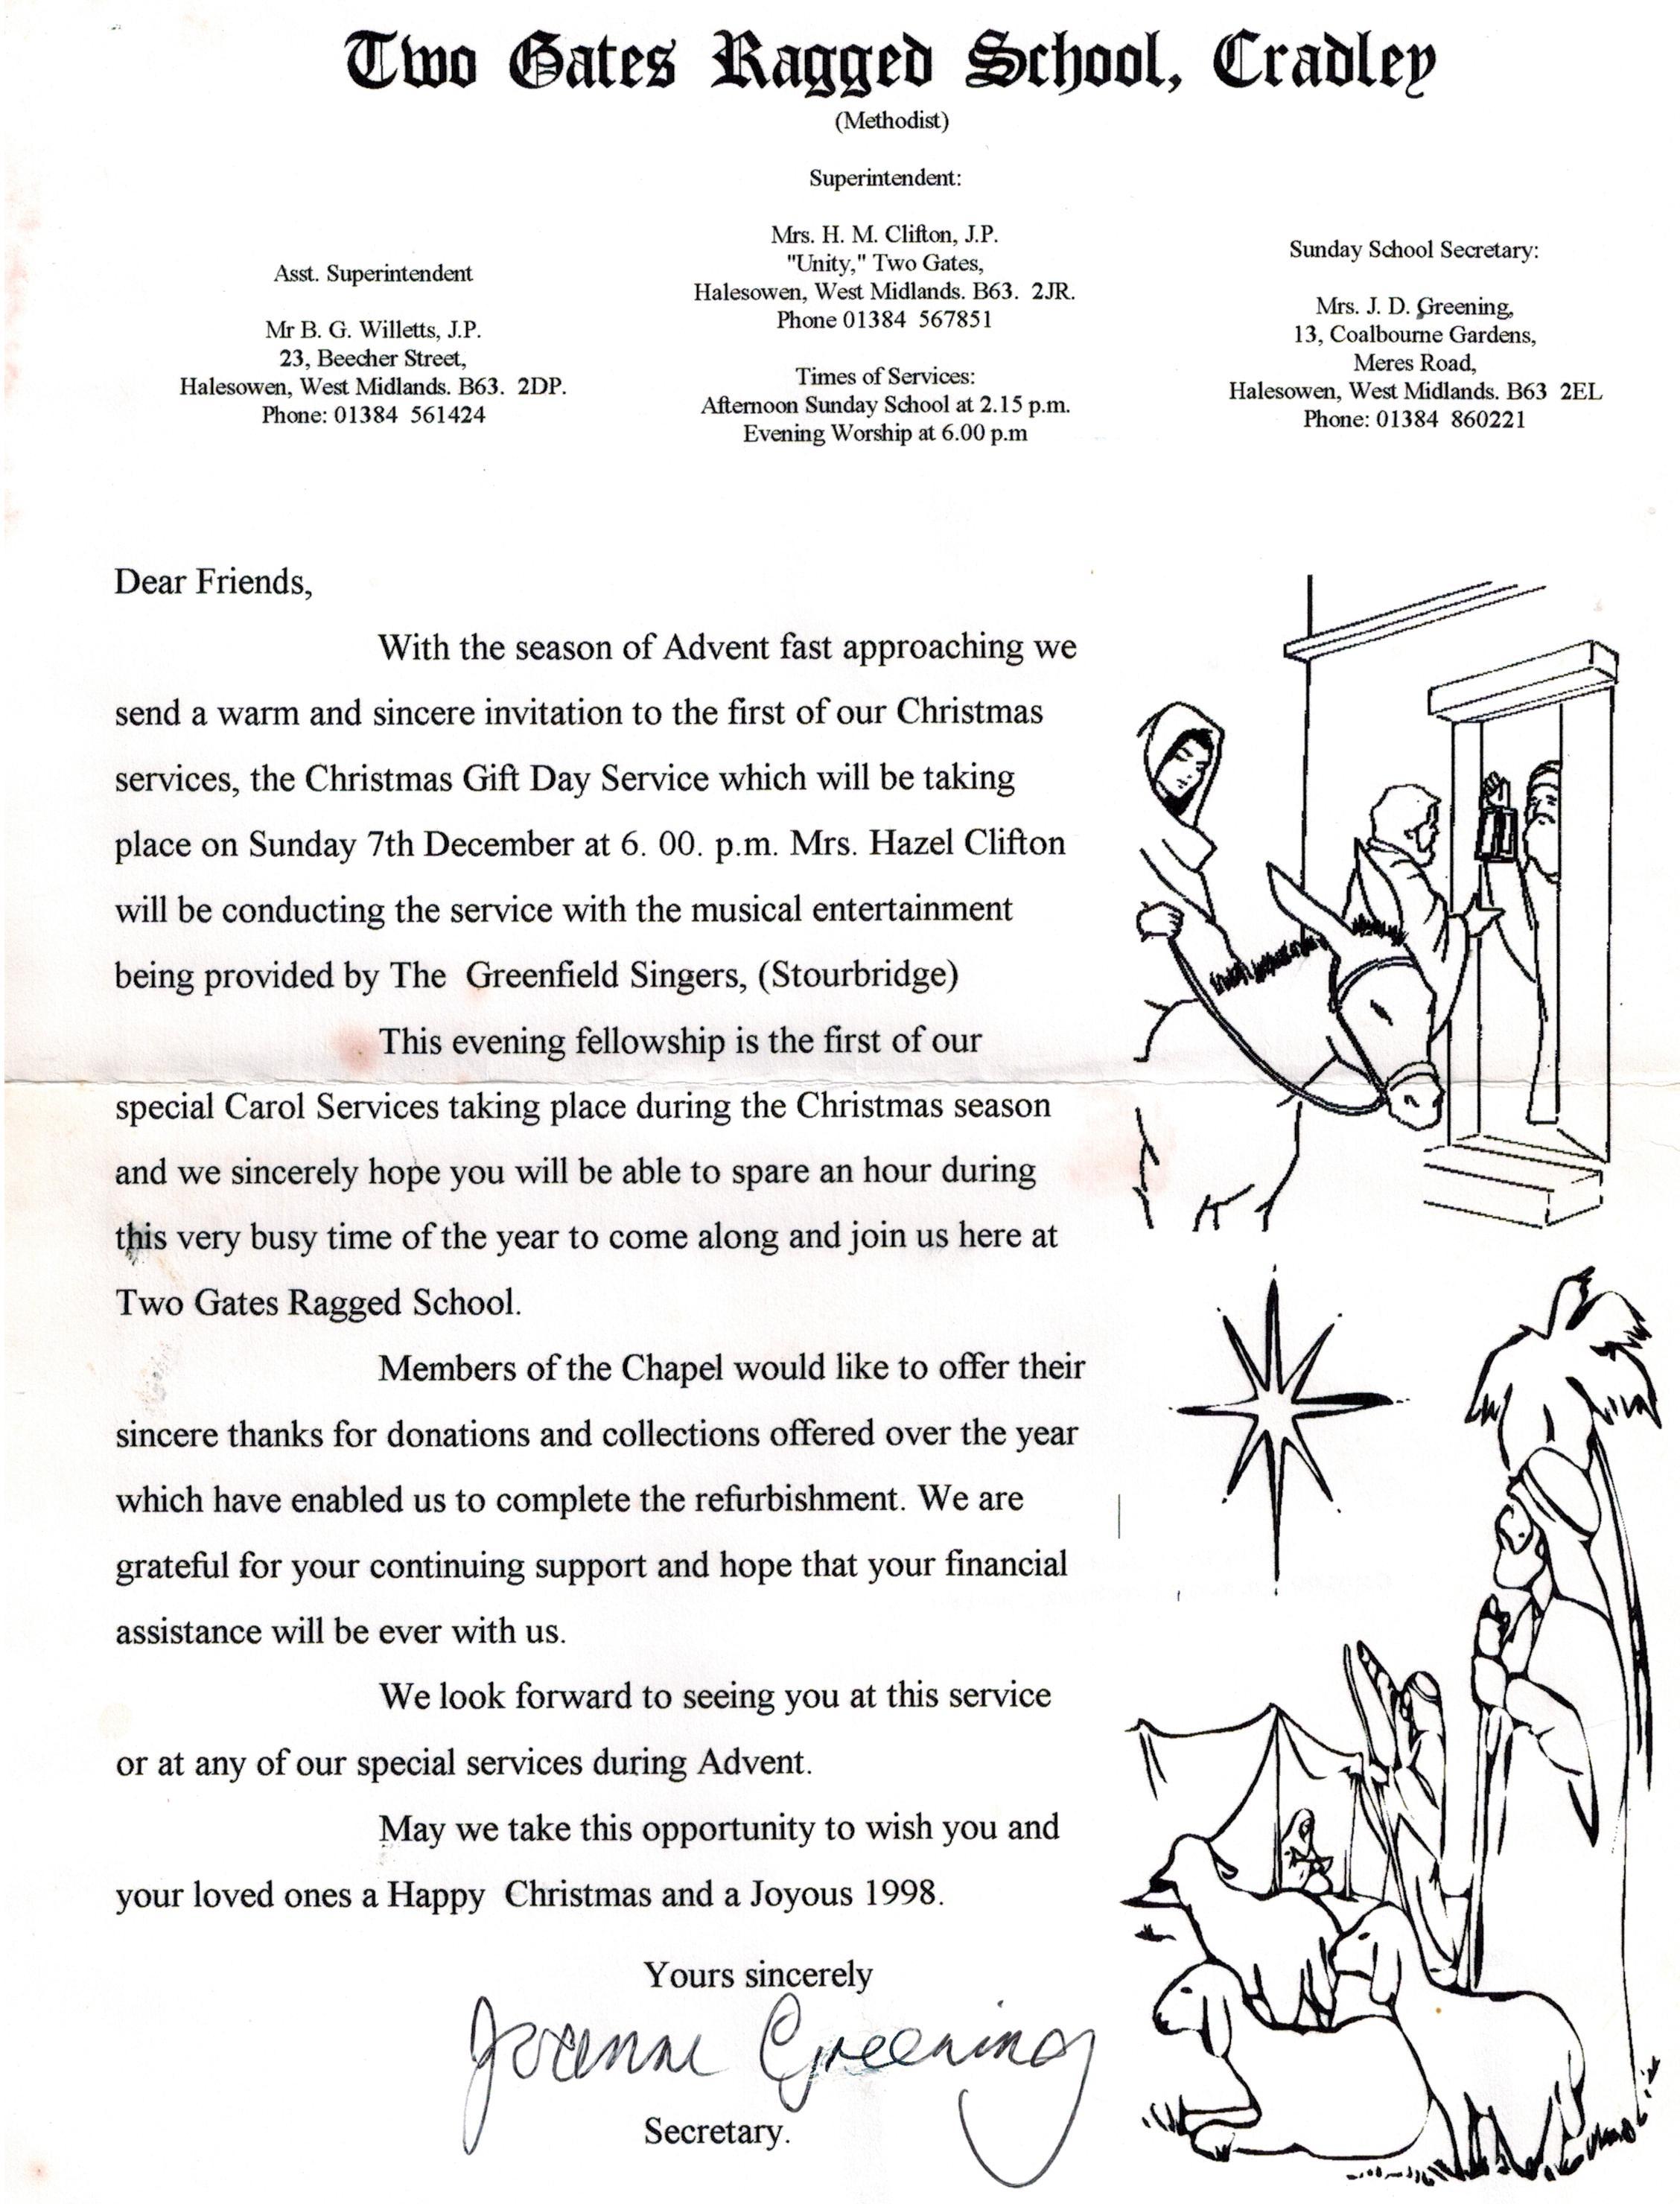 B186 Newsletter [Xmas1997]TGRS